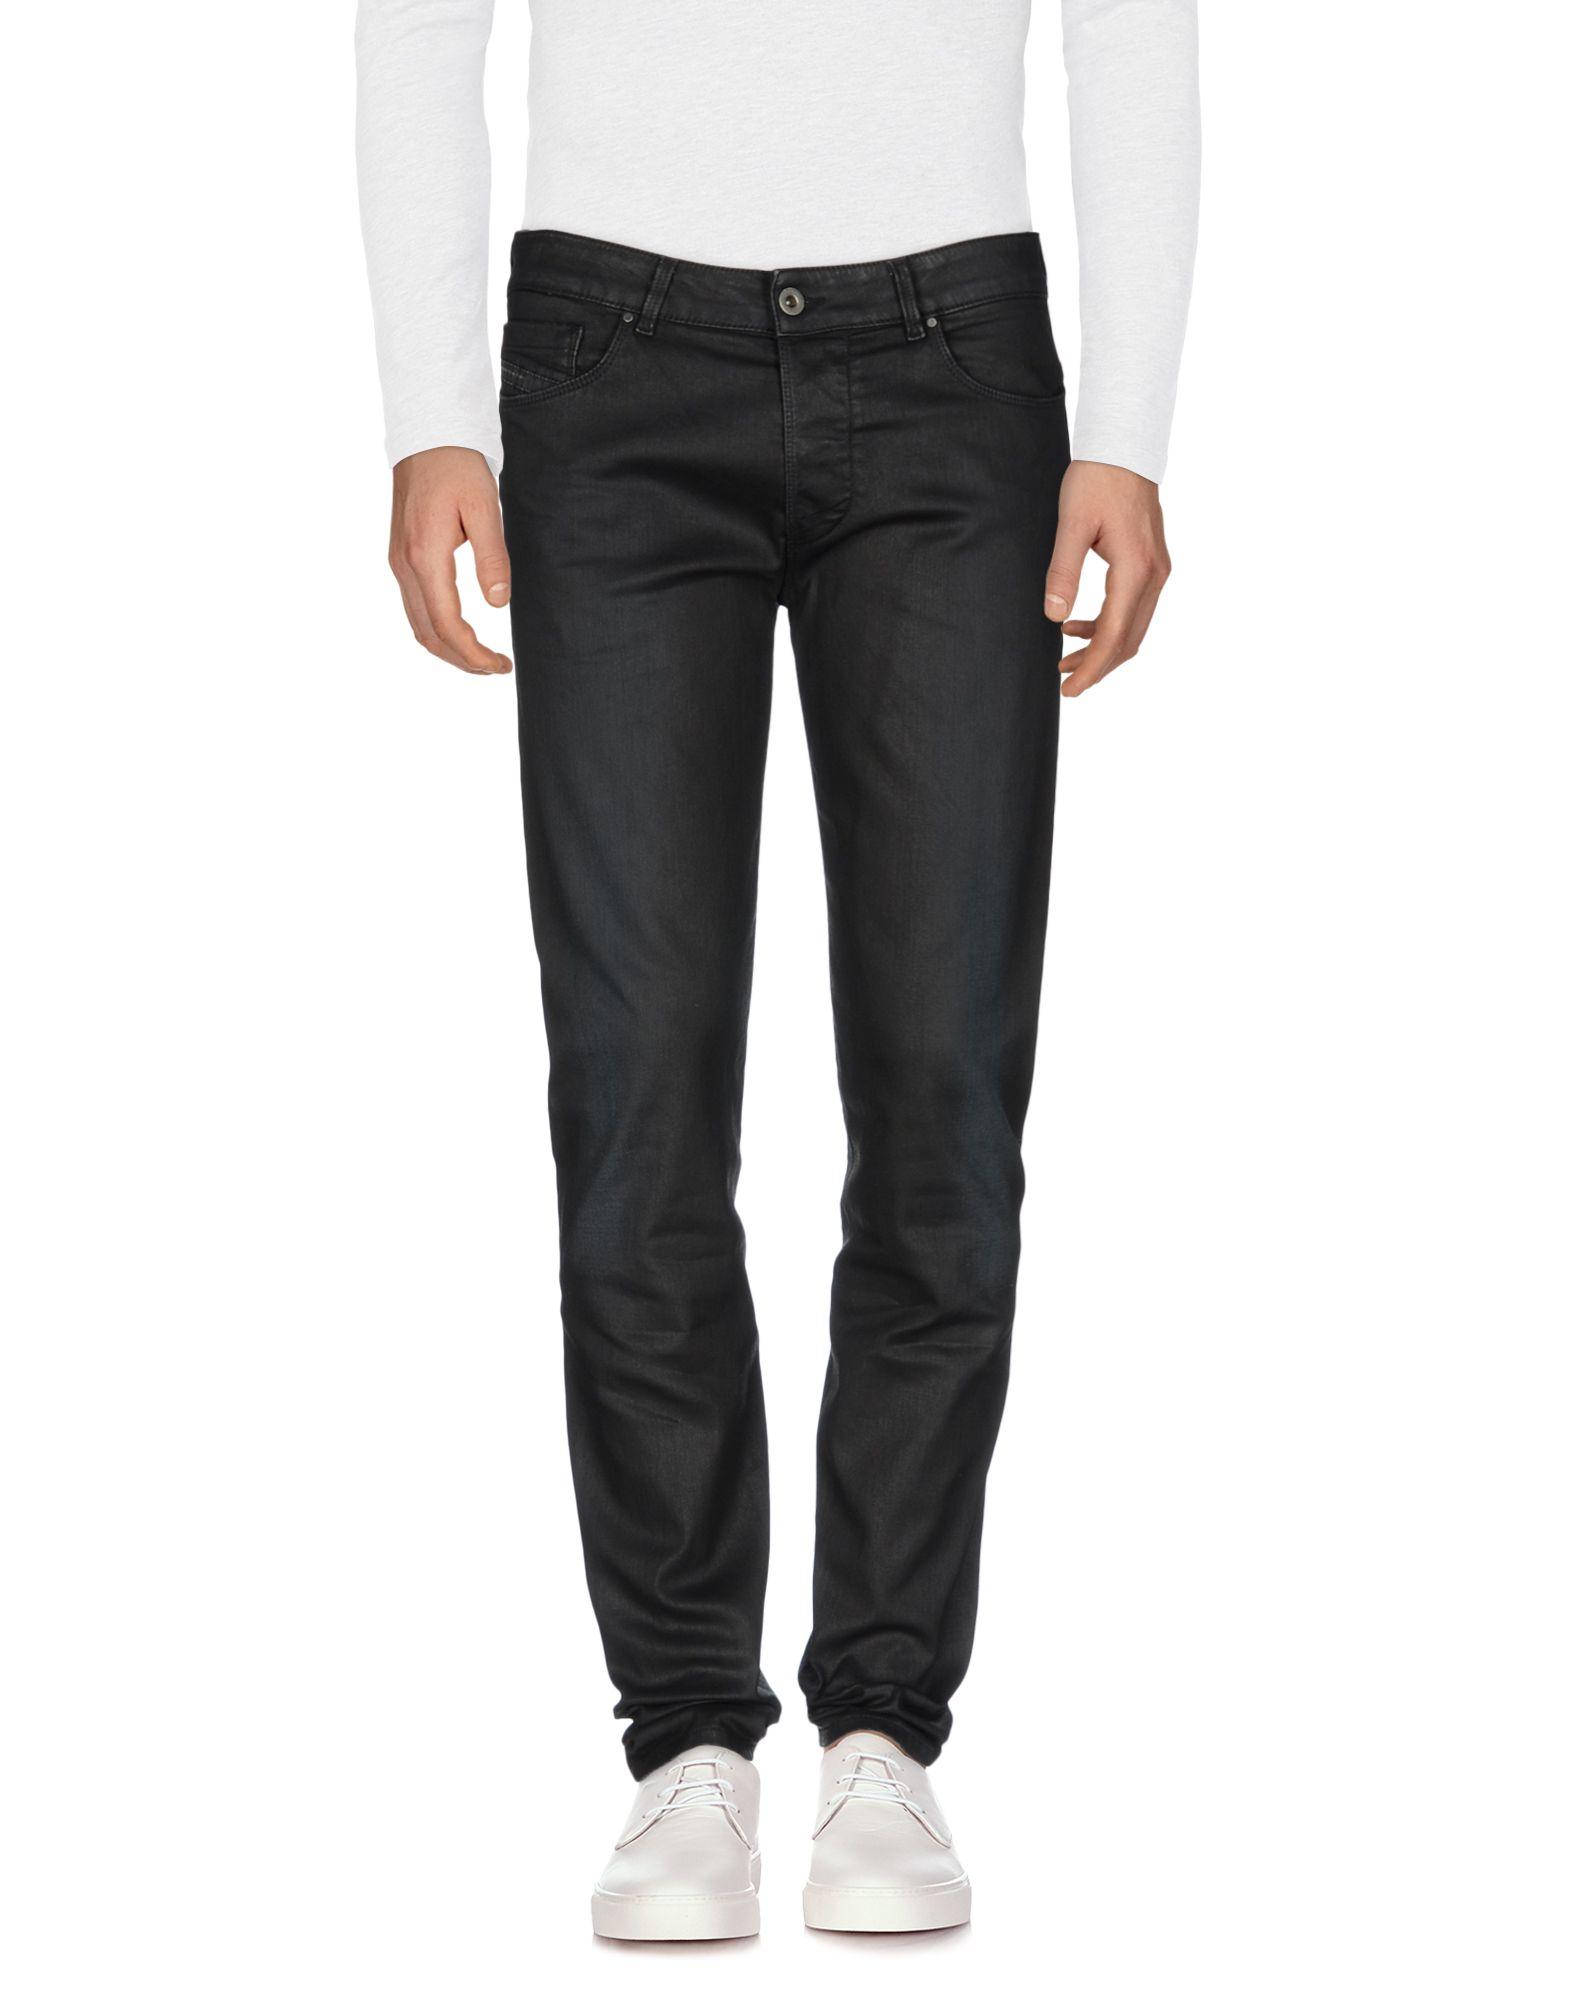 Pantaloni Jeans Diesel Black Gold Donna - Acquista online su